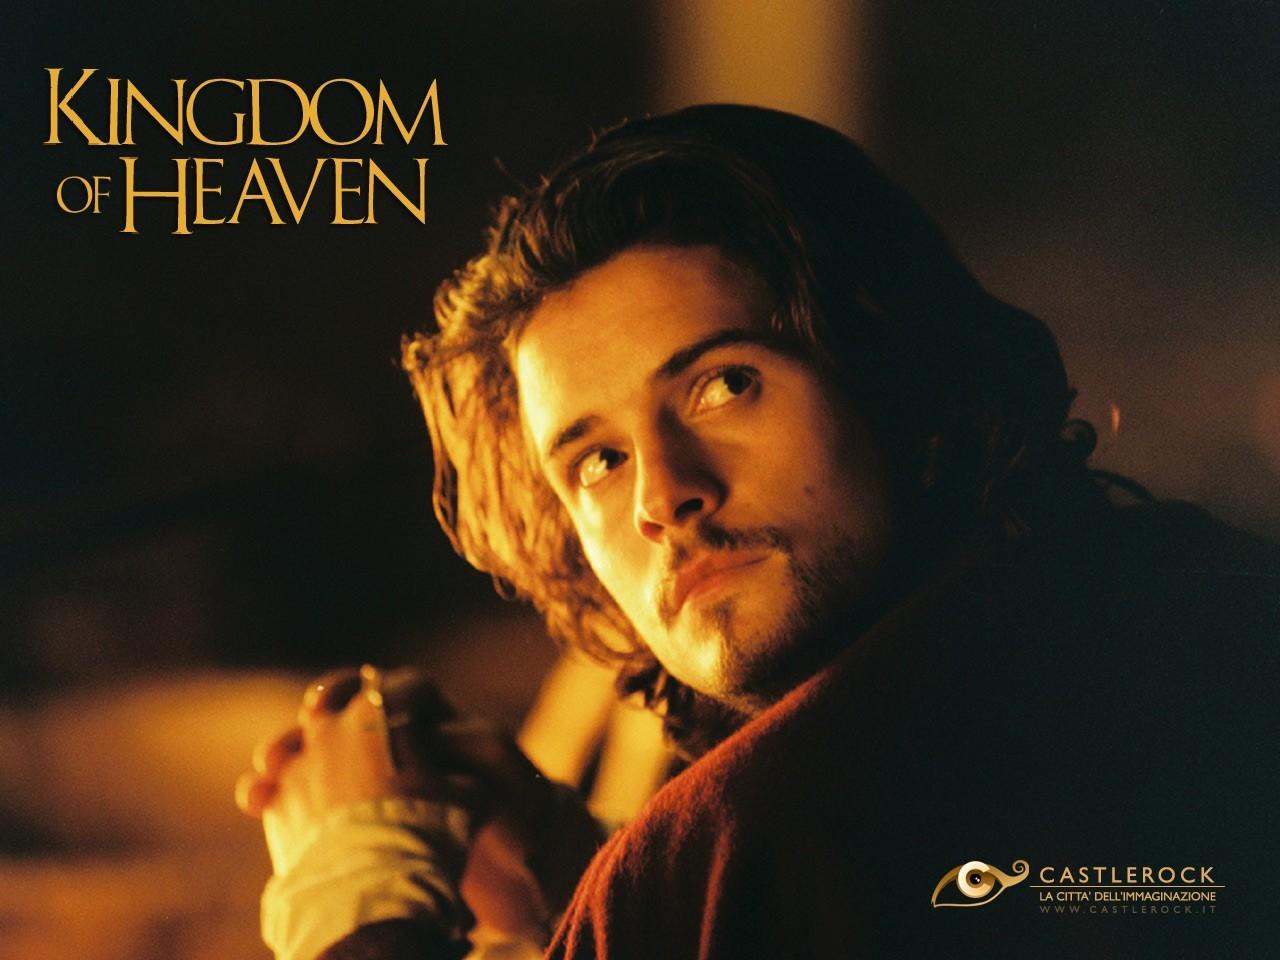 Wallpaper del film Le crociate con il protagonista Orlando Bloom